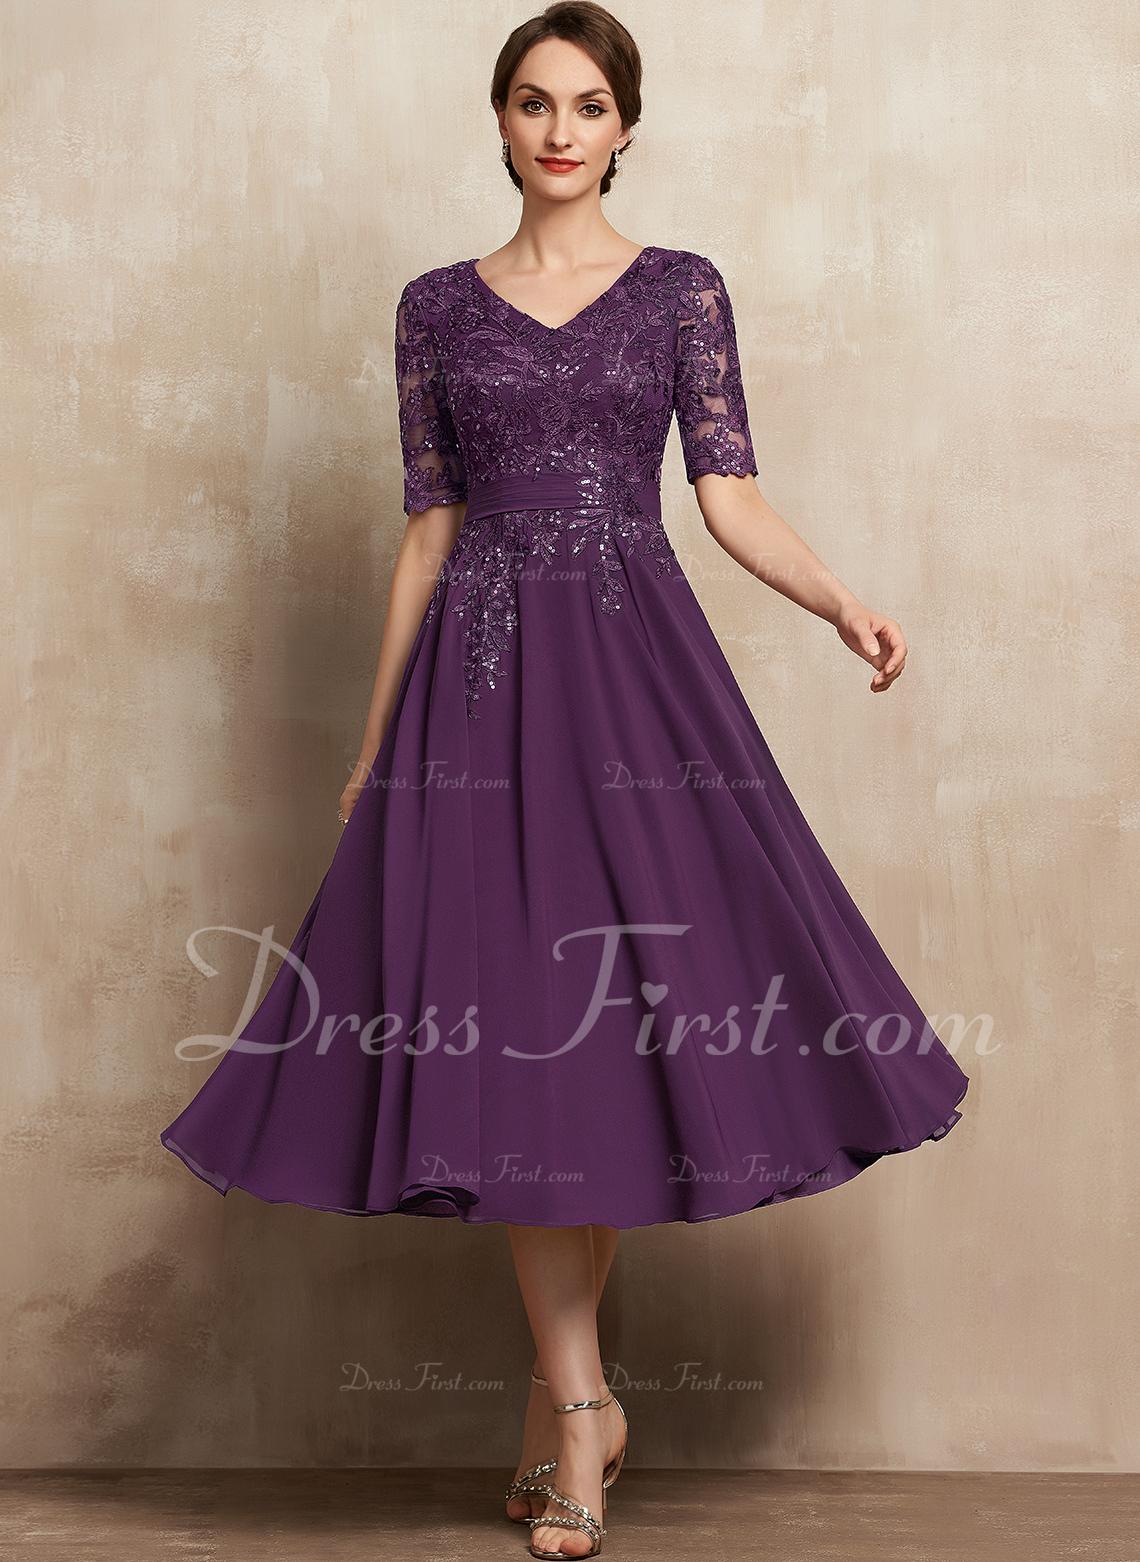 A-Line V-neck Tea-Length Chiffon Lace Cocktail Dress With Sequins